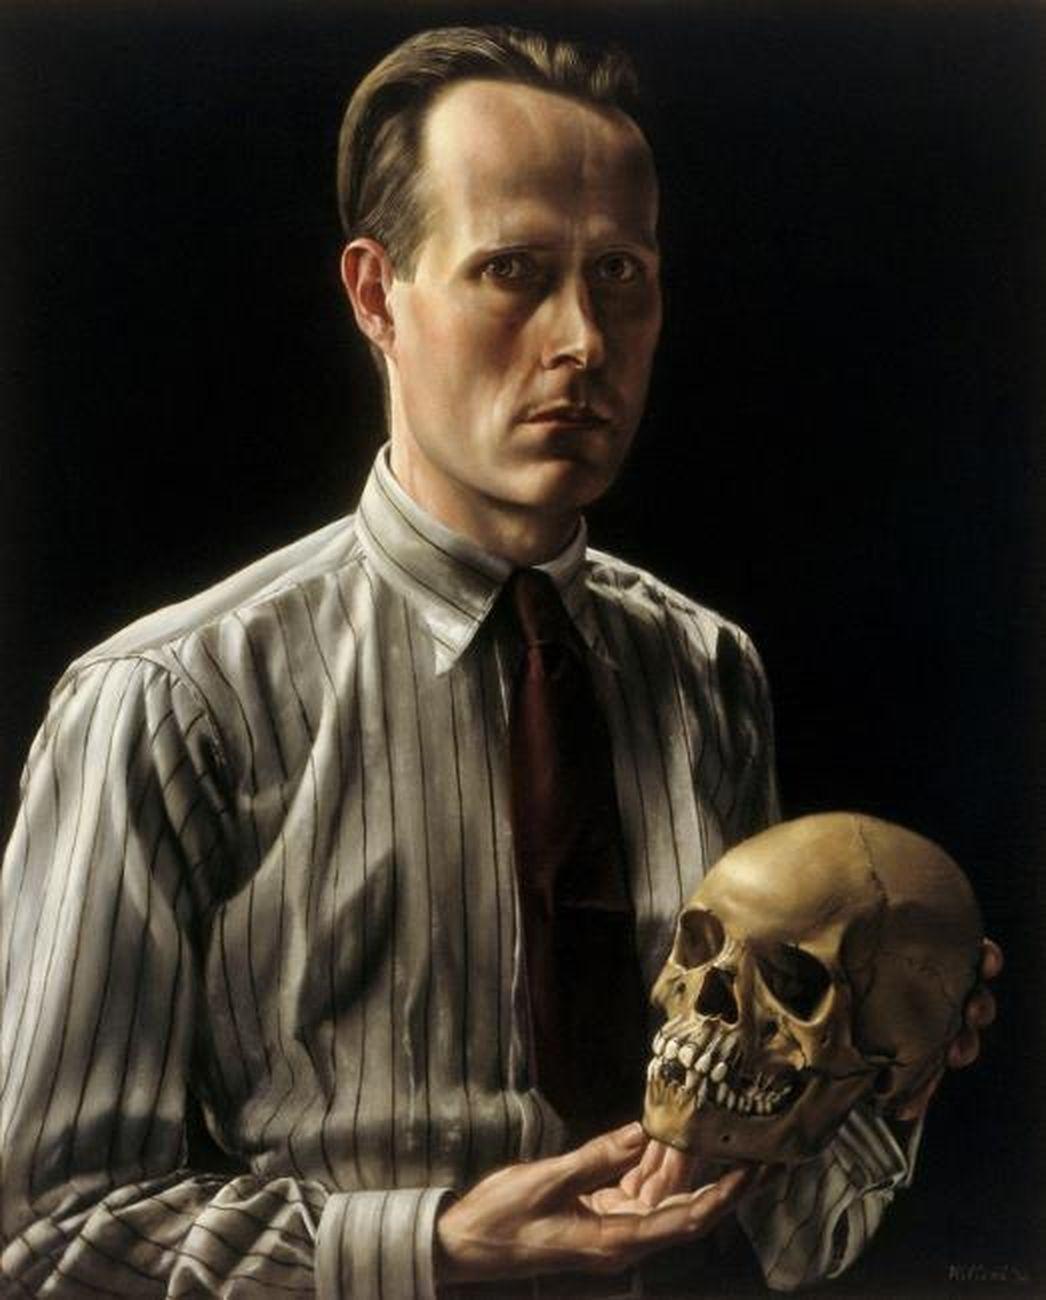 Carel Willink, Autoritratto con teschio, 1936